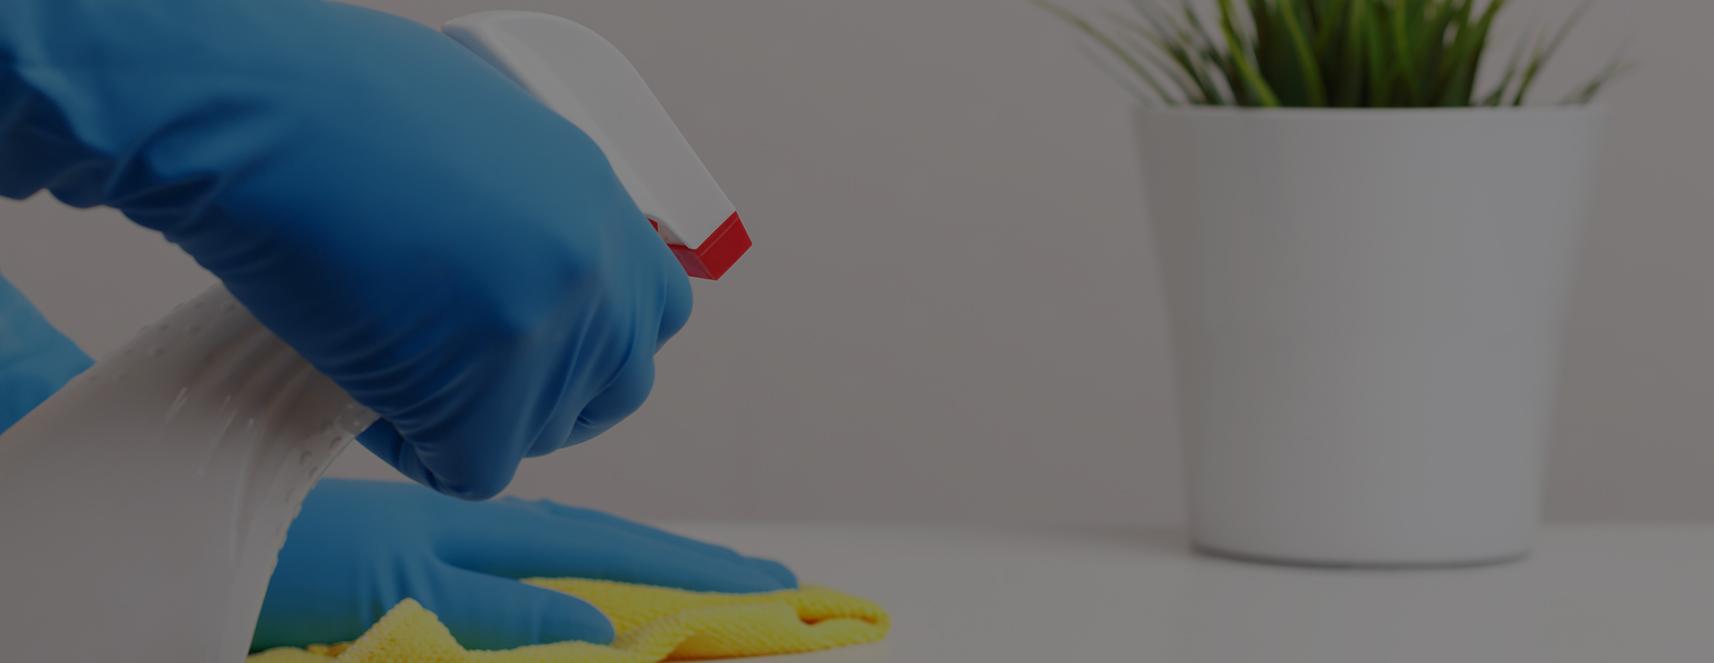 Commercial Sanitization Services